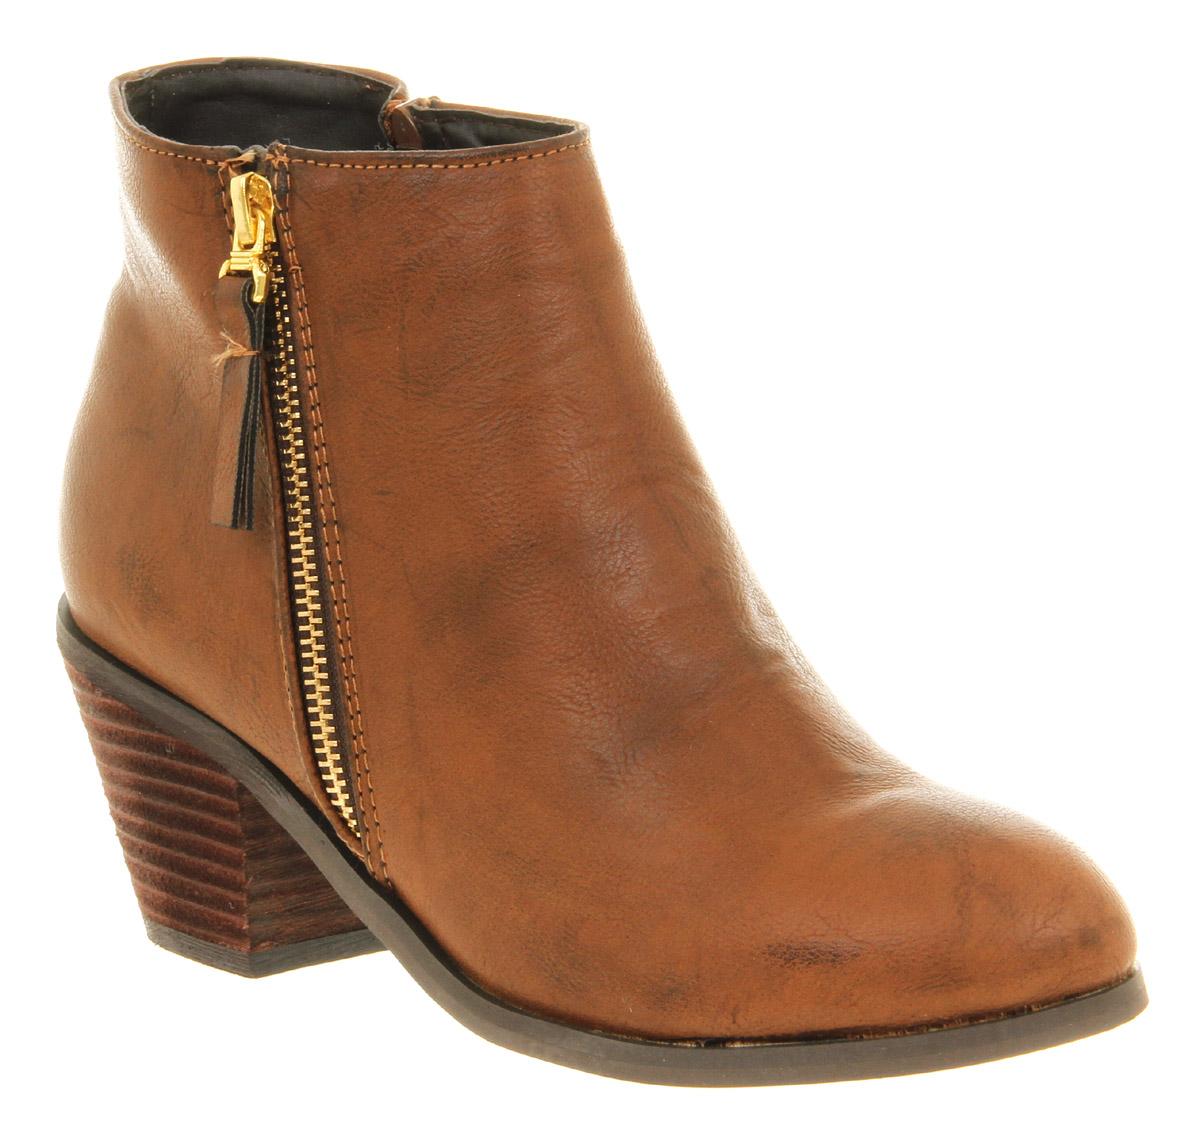 Karen Scott Shoes